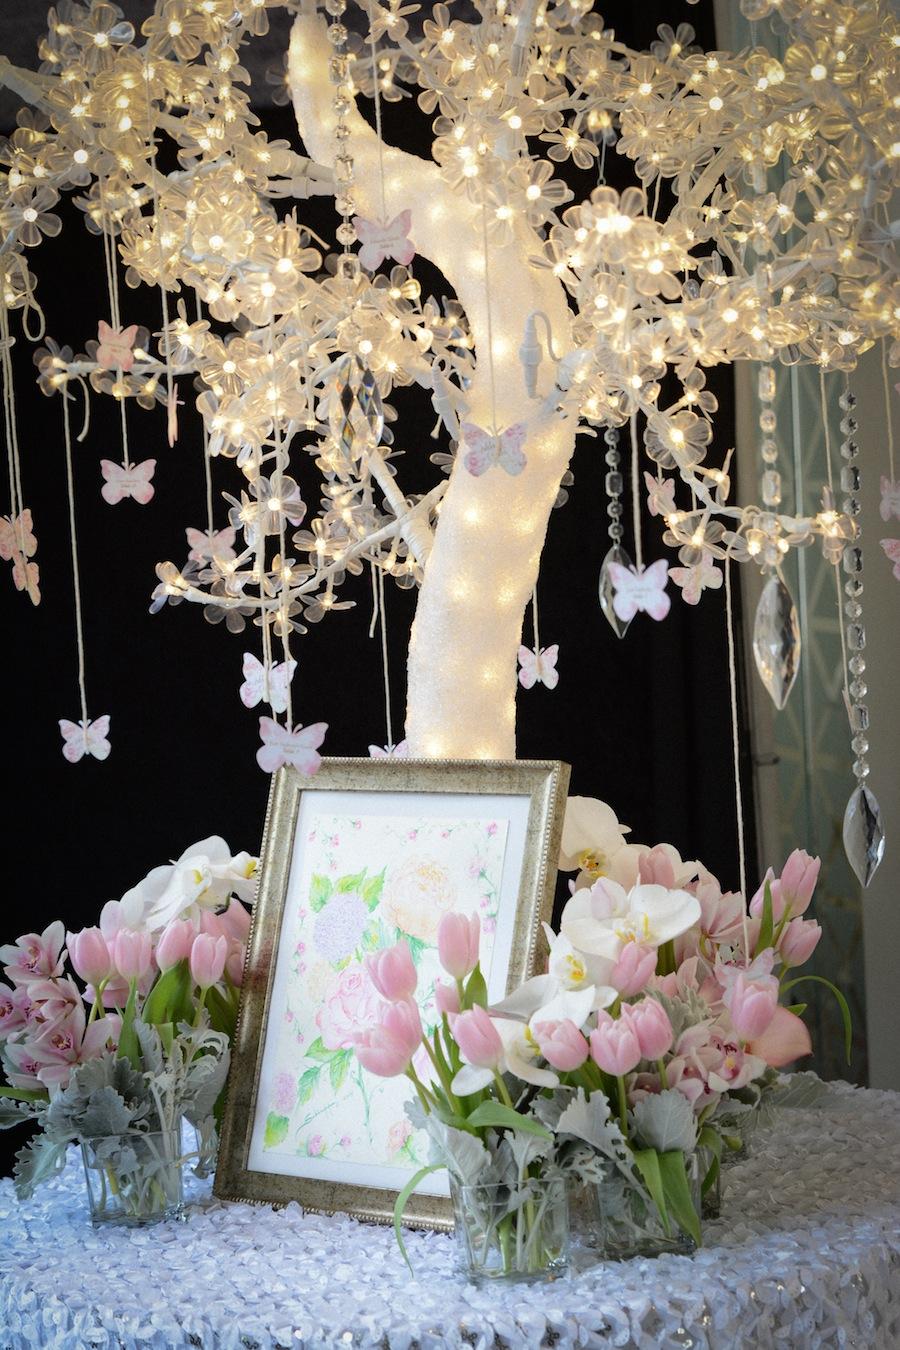 Lighted Wedding Reception Centerpiece with Hanging Butterflies